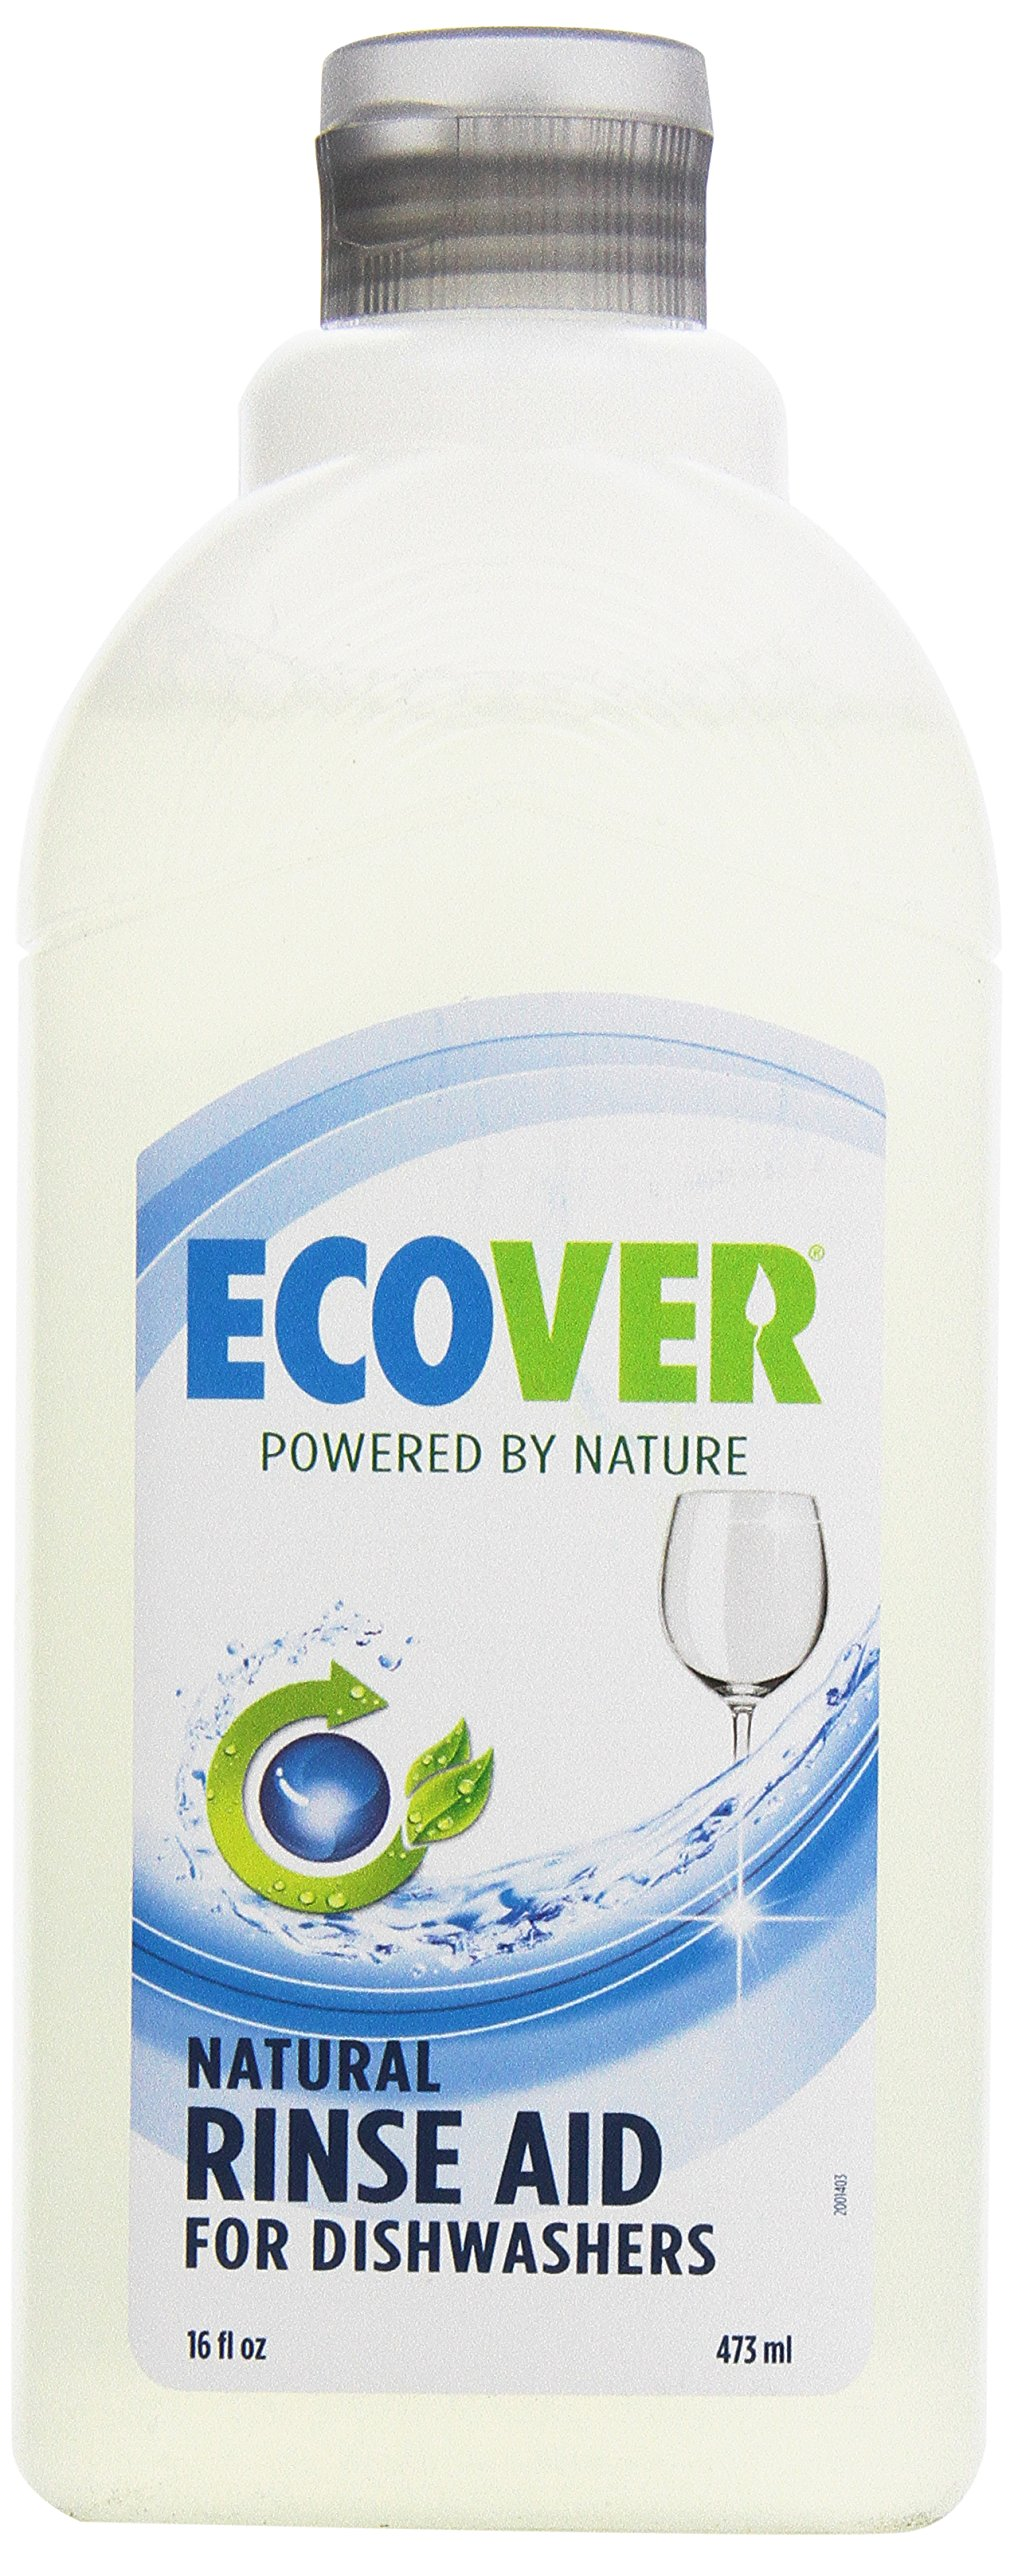 Ecover, Rinse Aid, 16 oz